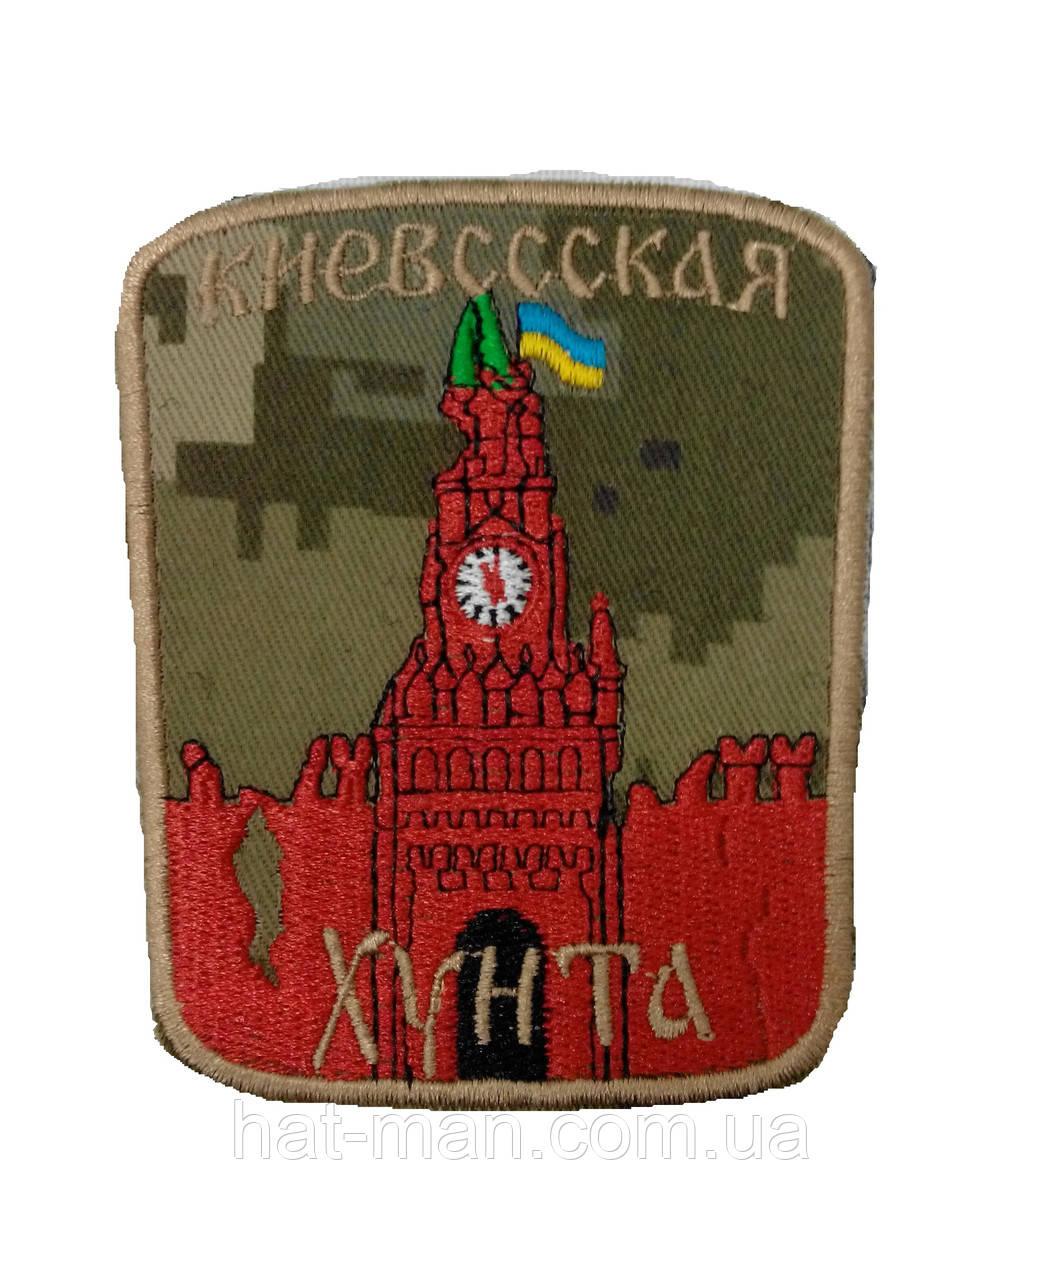 "Шеврон на липучці ""Киевссская хунта"""